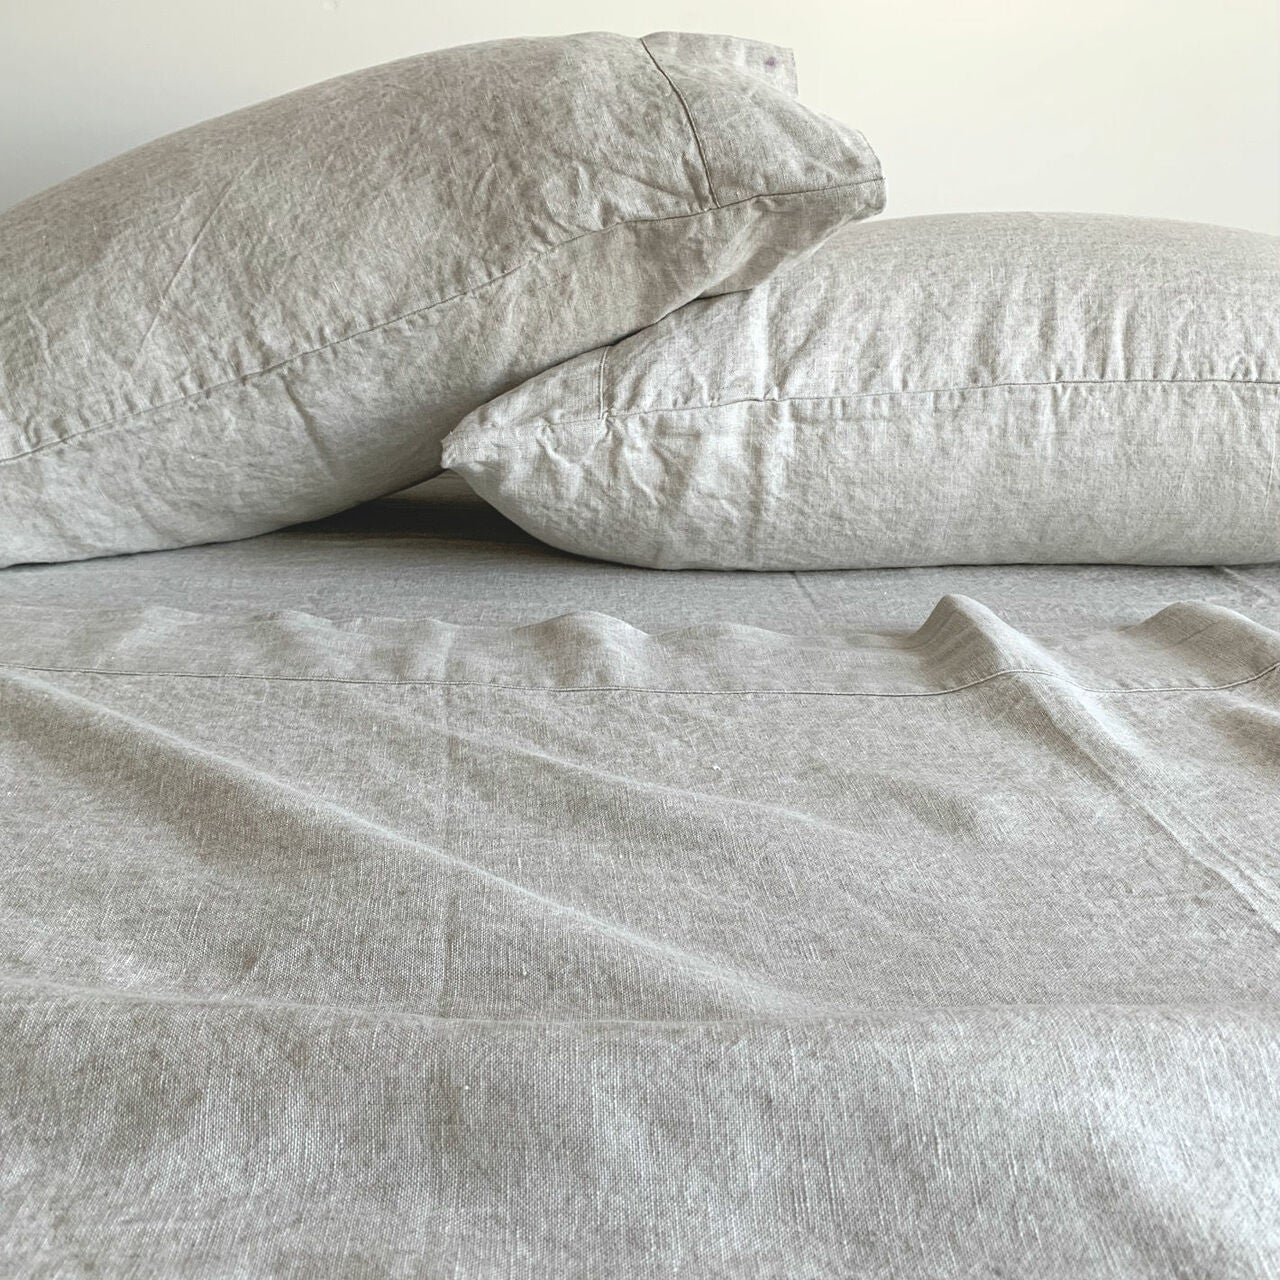 light tan linen sheets and matching pillowcases